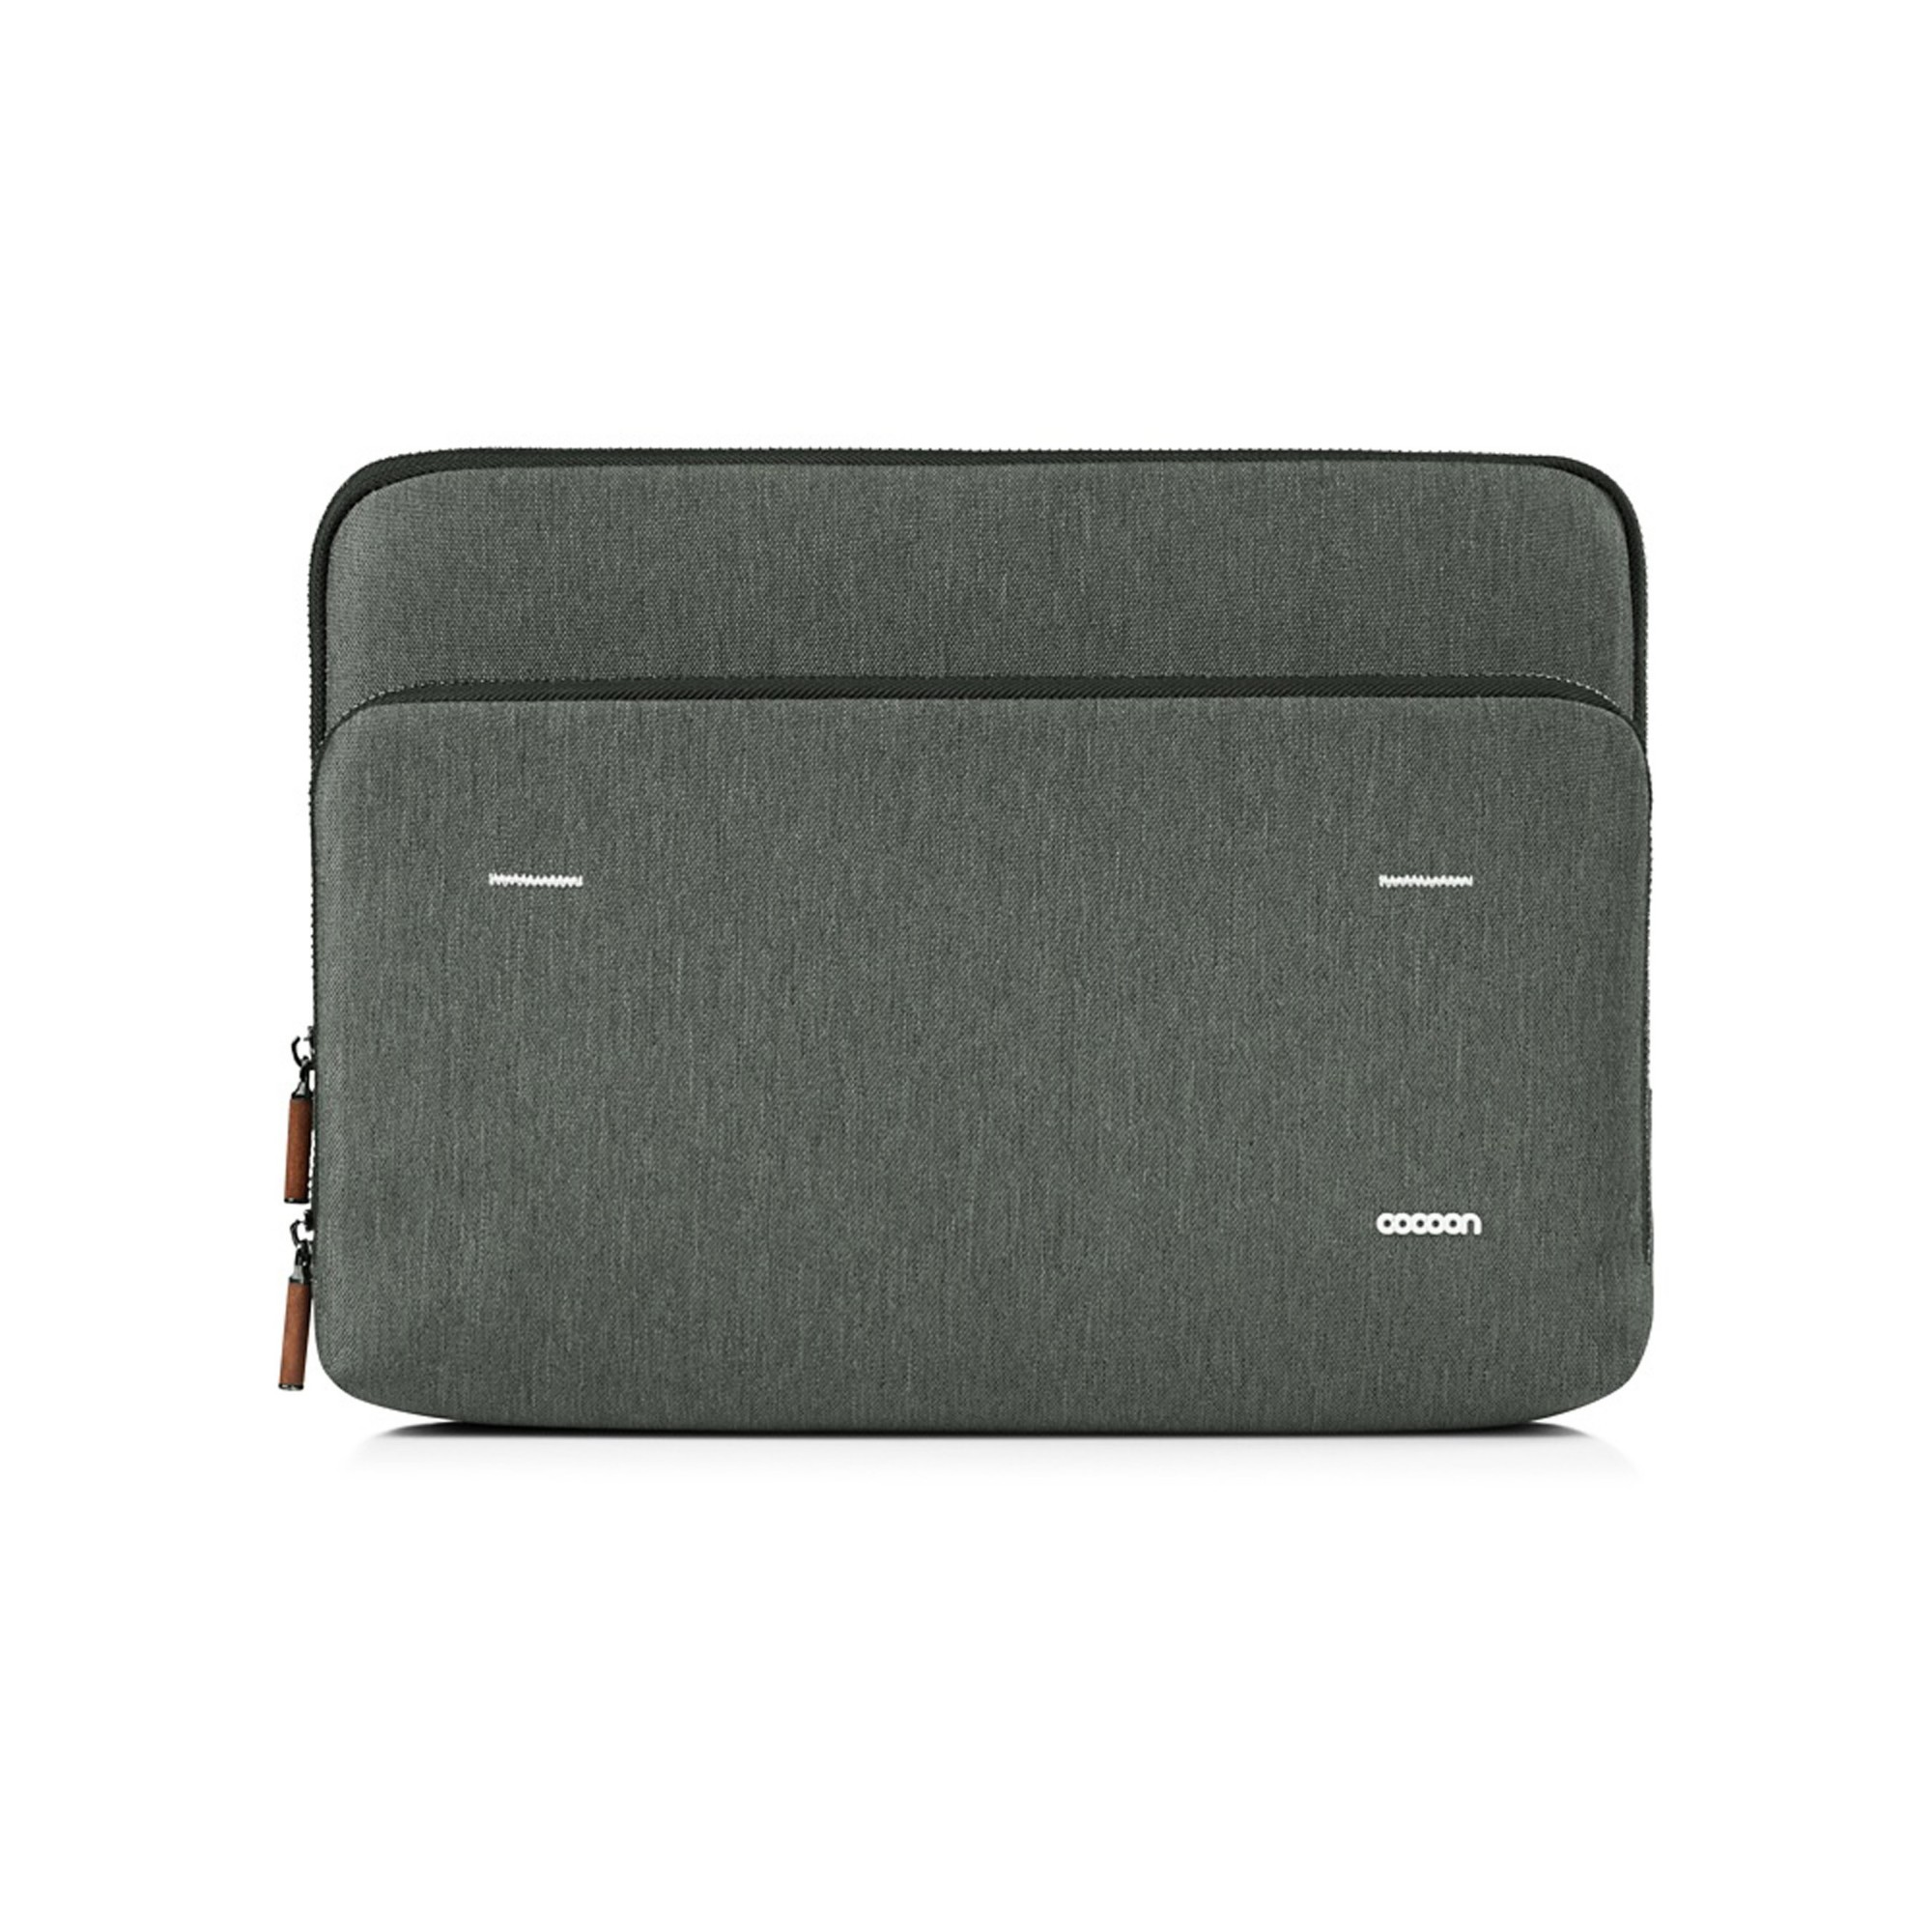 "Cocoon MCS2201 notebook case 27.9 cm (11"") Sleeve case Grey"